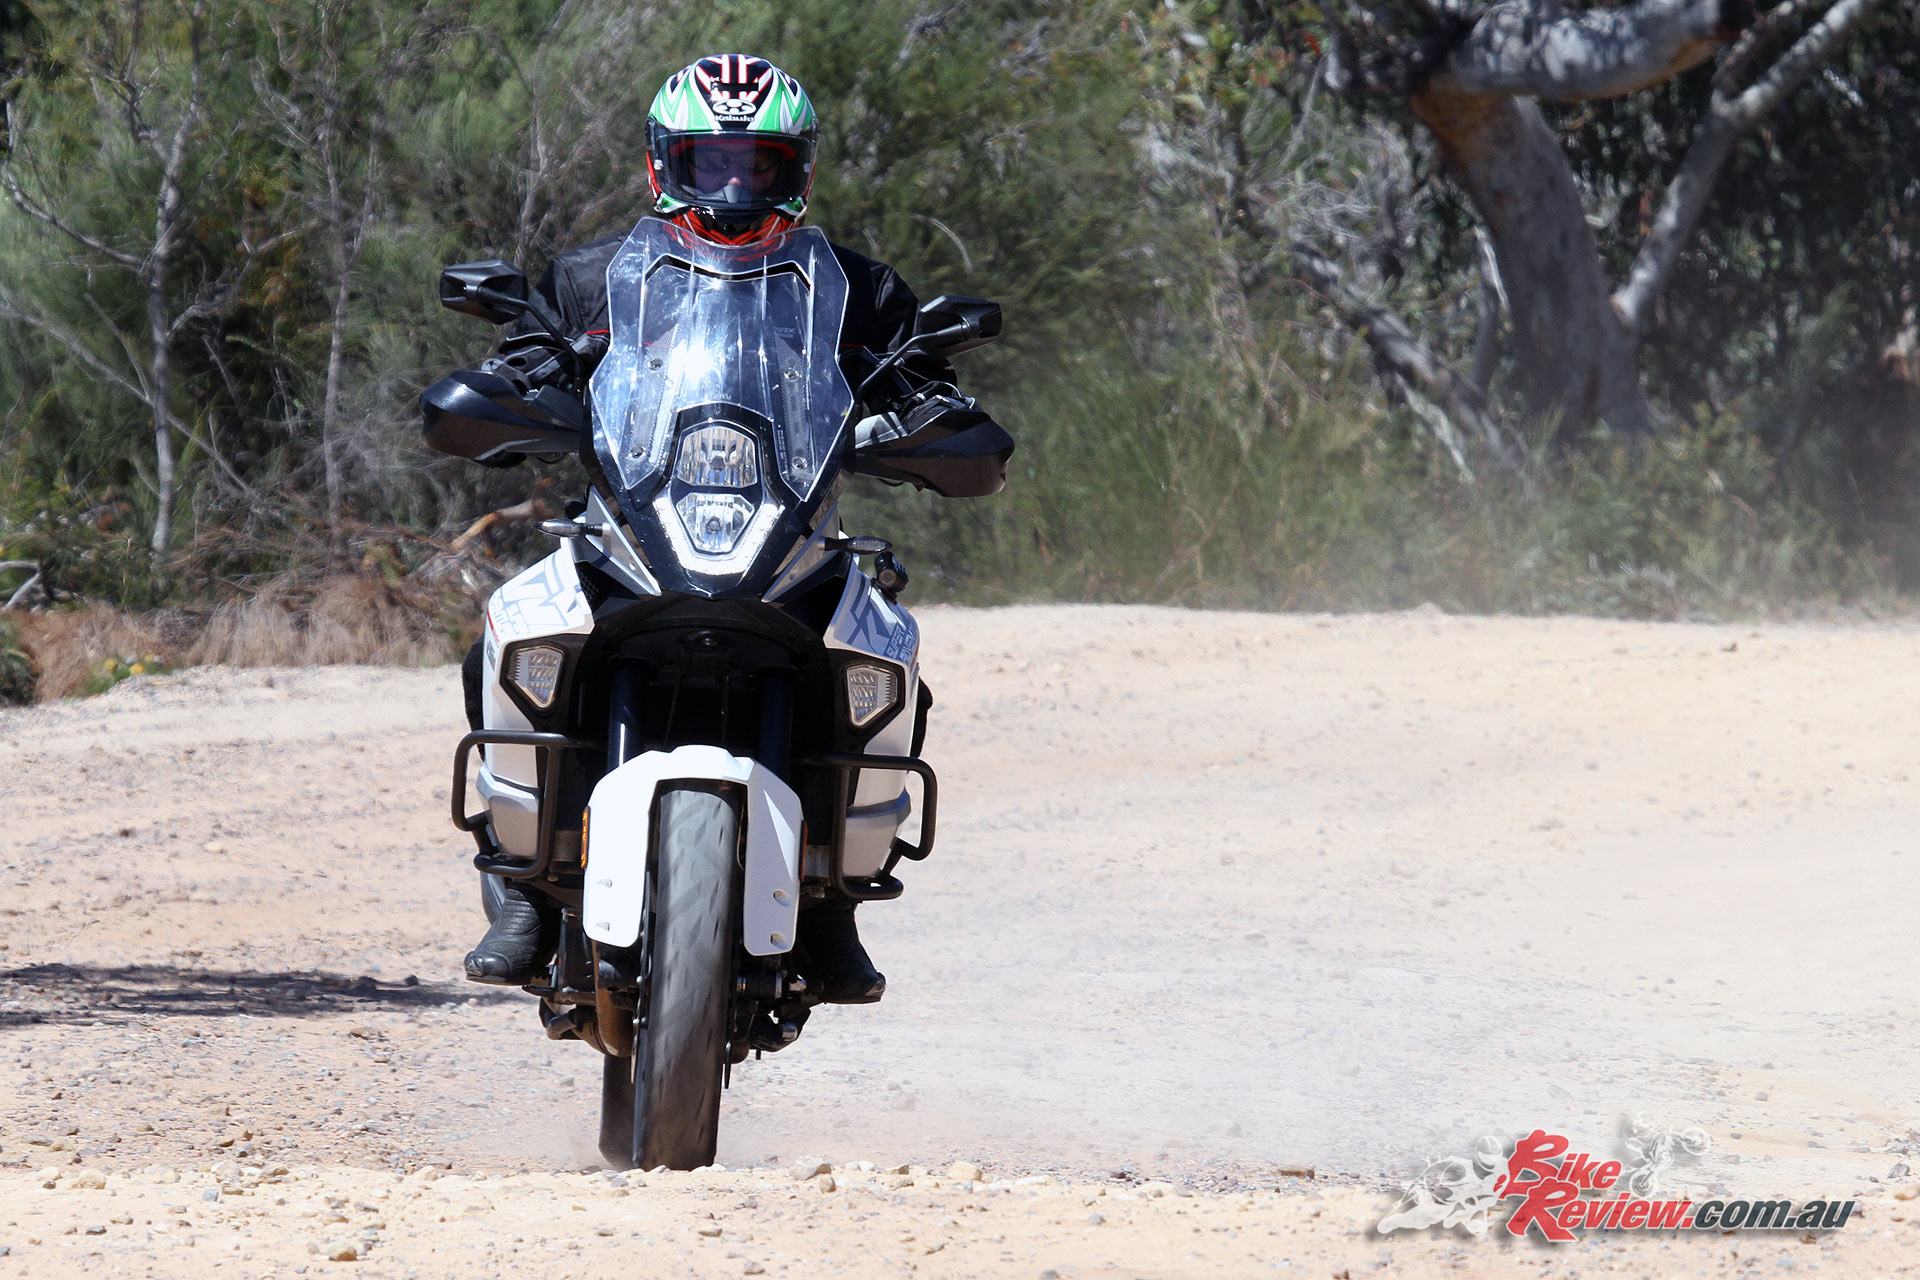 Review 2016 Ktm 1290 Super Adventure Bike Review